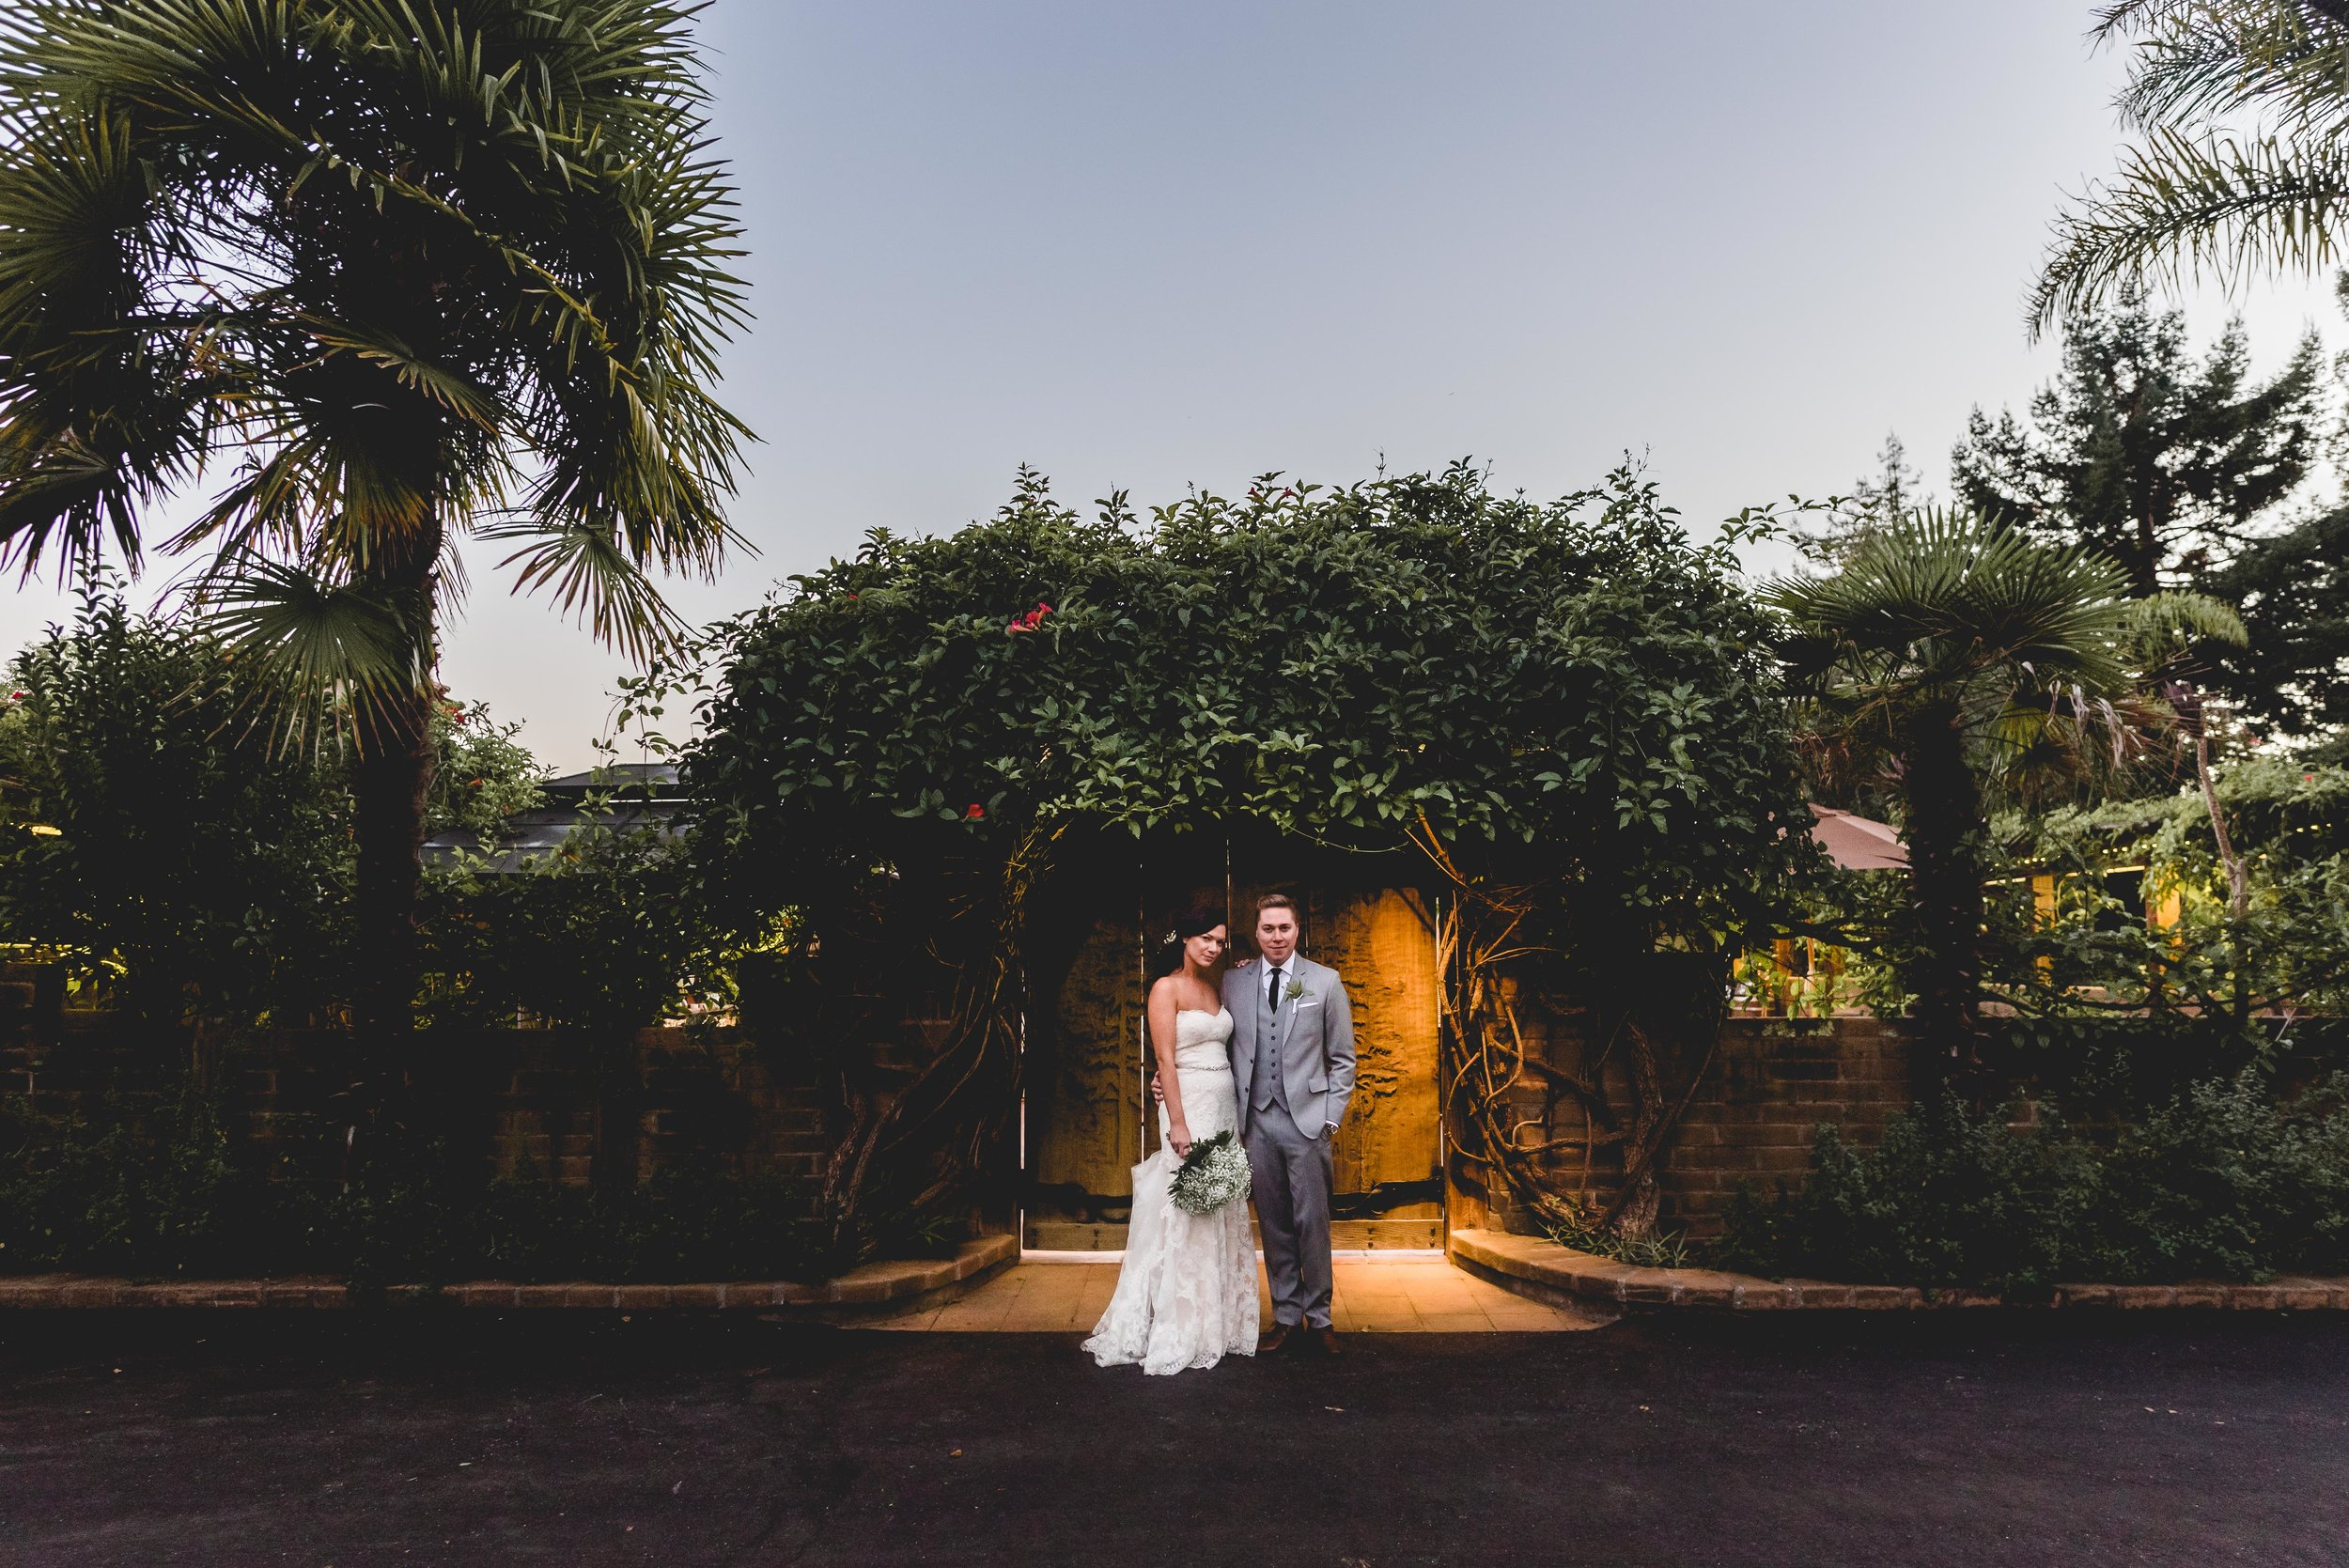 santa-cruz-kennolyn-wedding-photographer-01.jpg